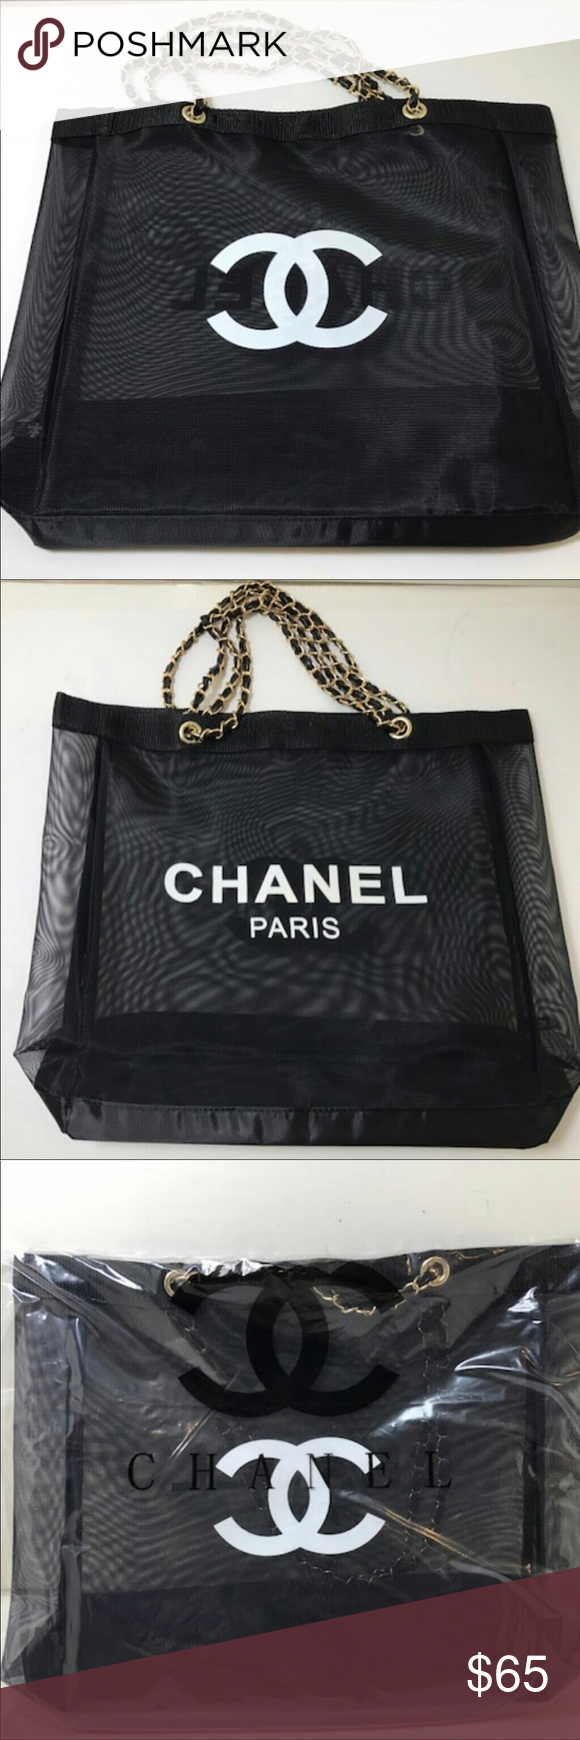 36befb3c4b85 Chanel VIP gift mesh tote bag Chanel shopping bag CHANEL Bags Totes ...